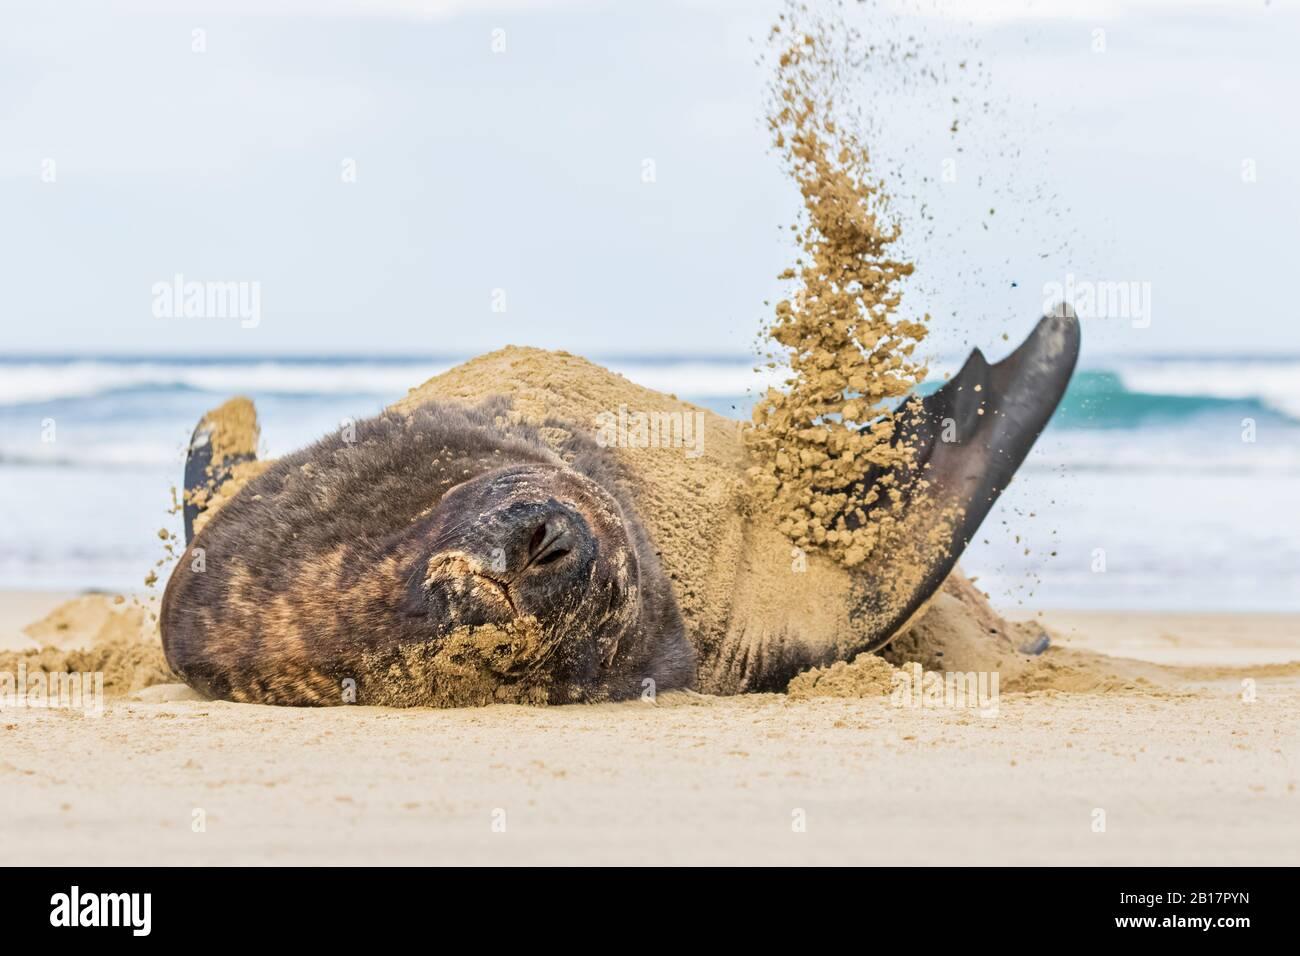 New Zealand, Oceania, South Island, Otago, Southeast, Catlins Coast, New Zealand Sea Lion (Phocarctos hookeri) tossing sand in Purakaunui Bay Stock Photo